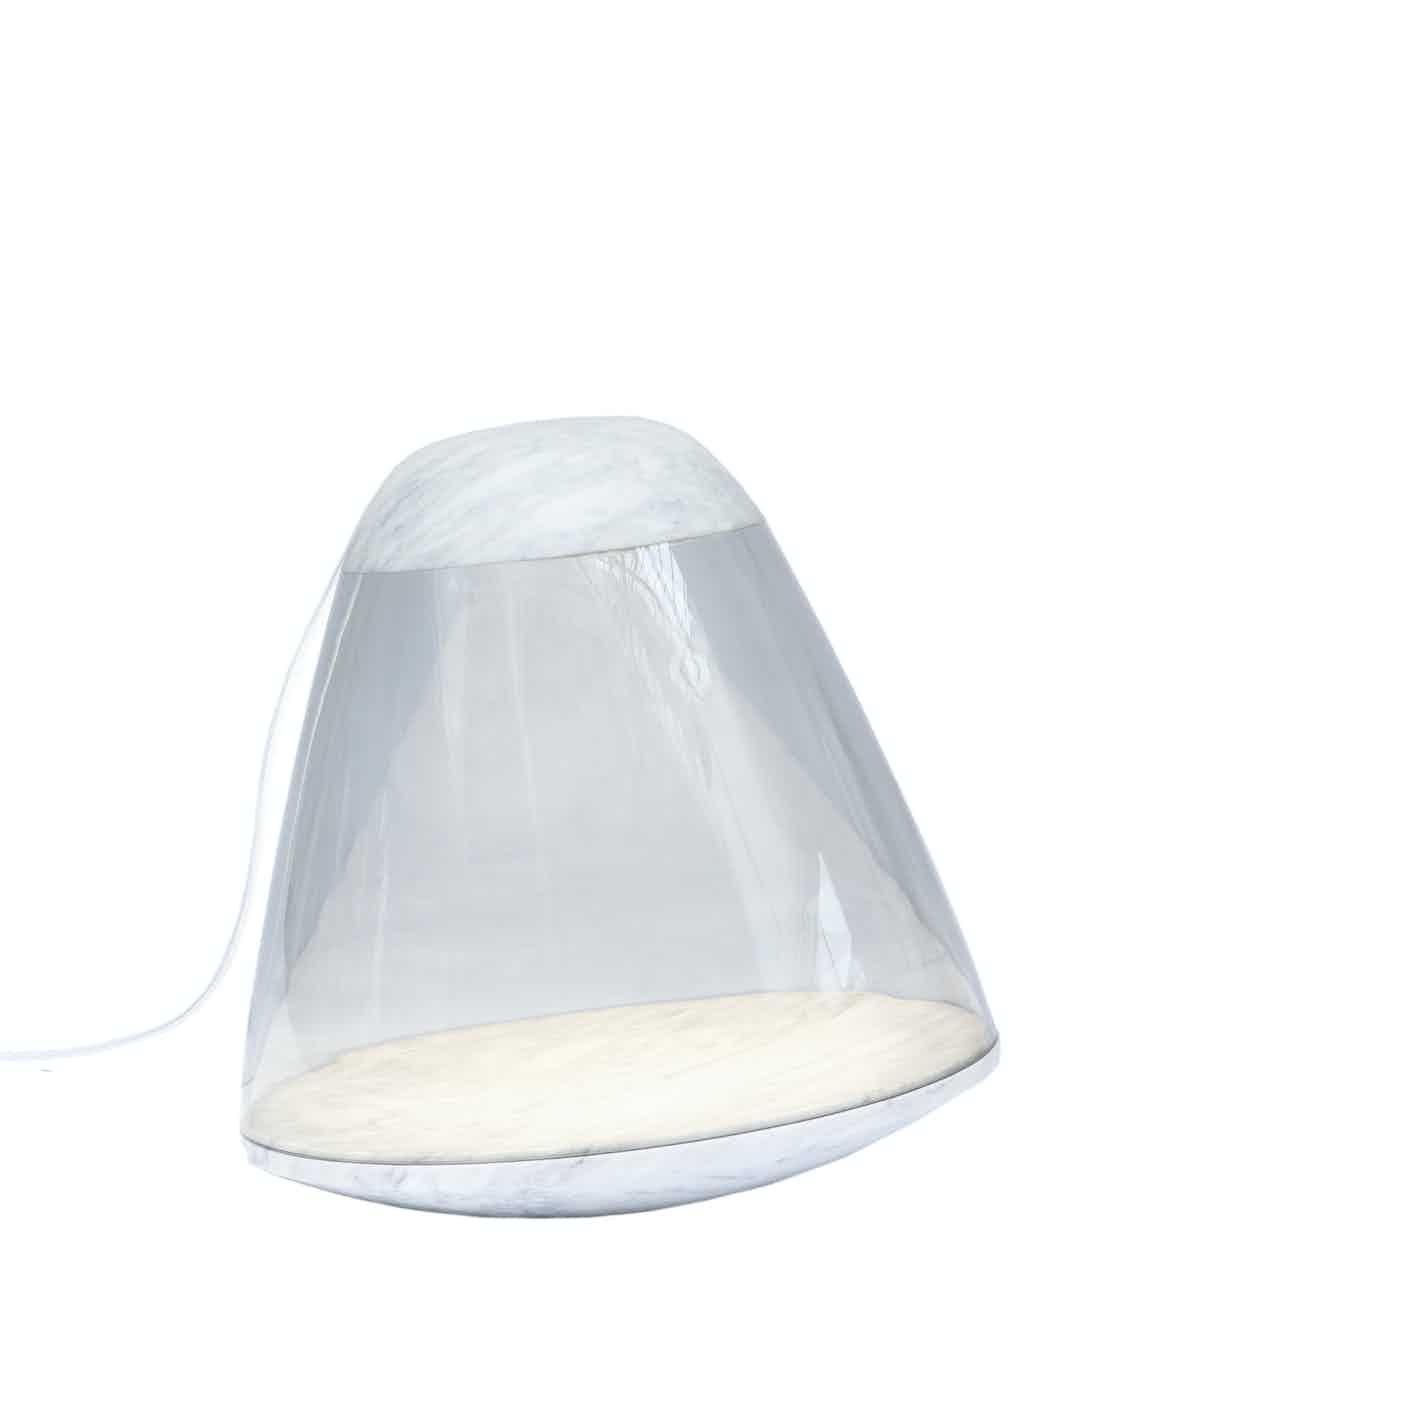 La-chance-furniture-apollo-floor-lamp-white-left-haute-living